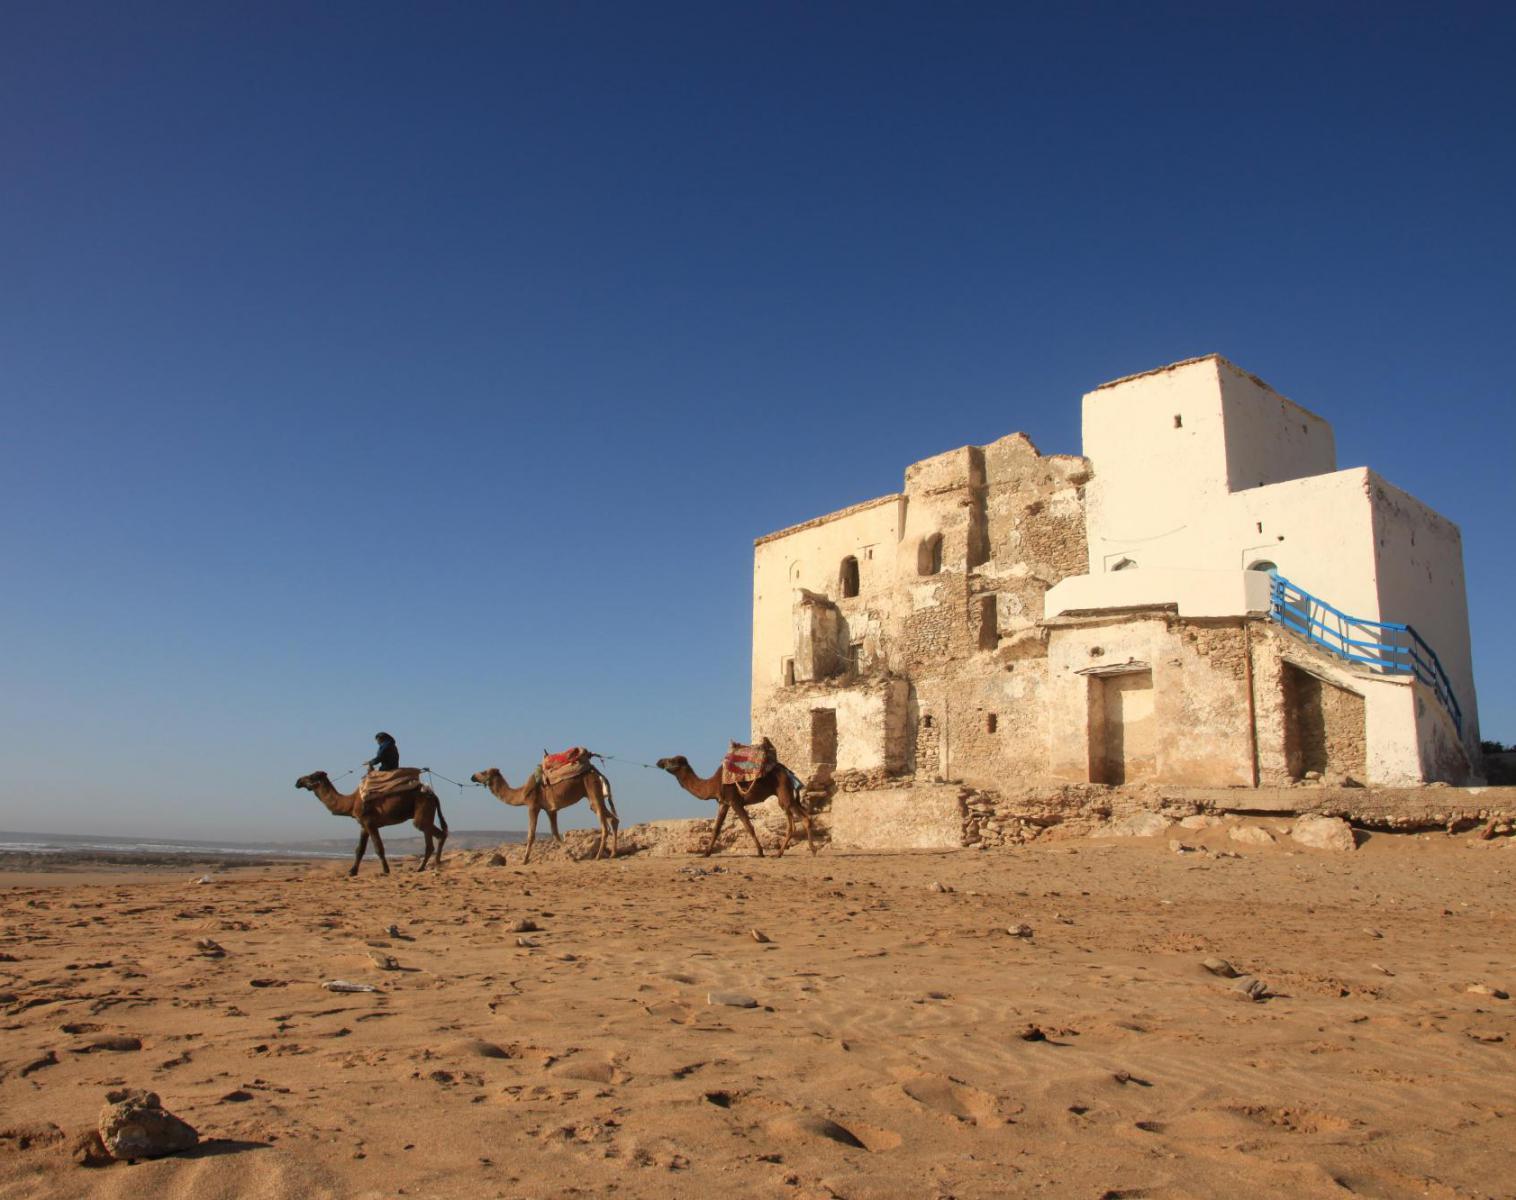 Maroc  Essaouira et sa côte Atlantique sauvage   Trek & Randonnée